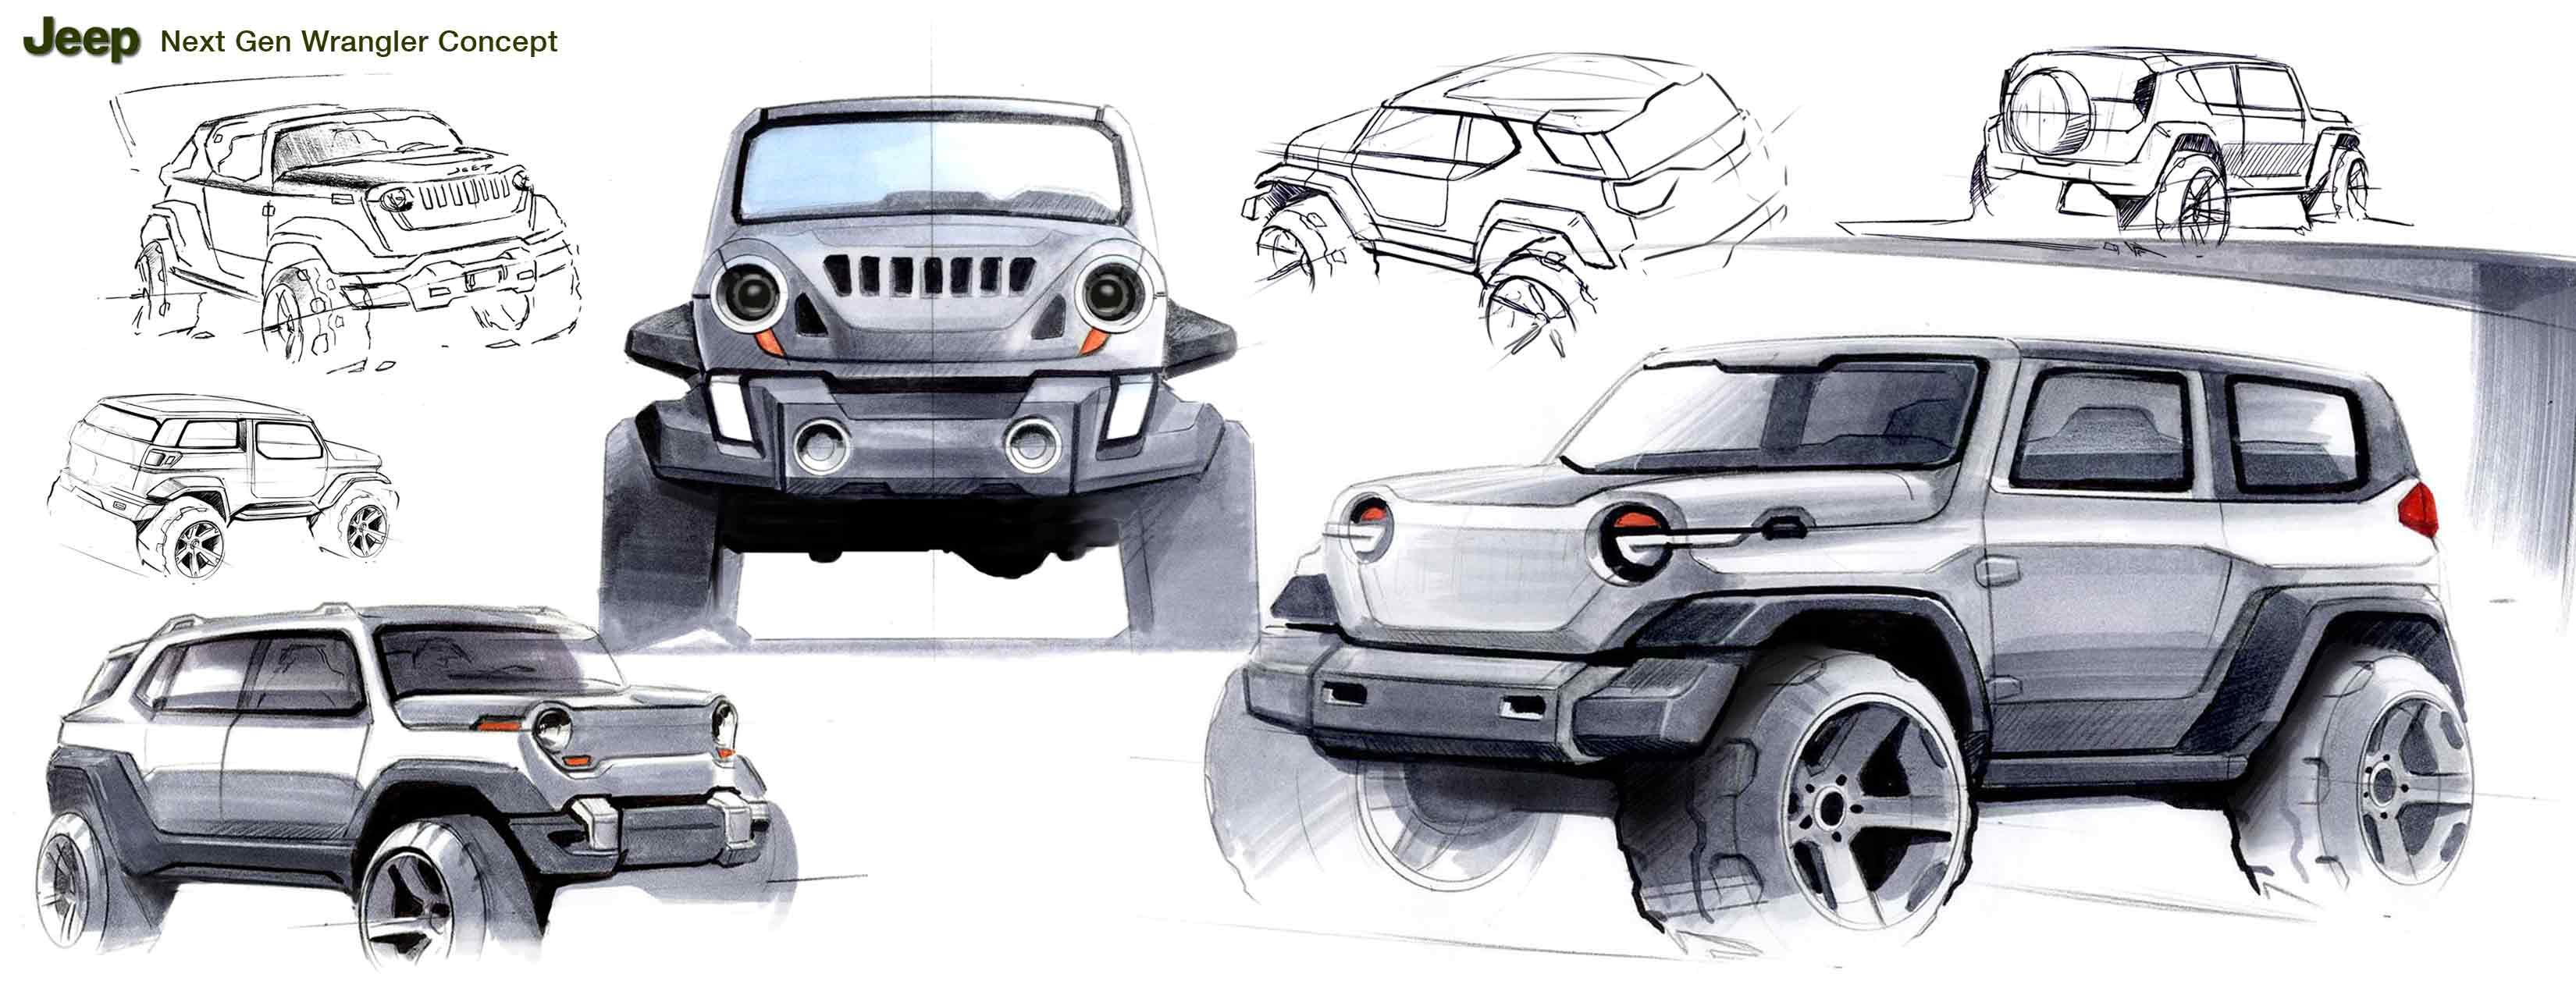 Jeep Chrysler Concept Work By Kevin J Chun Chuntek